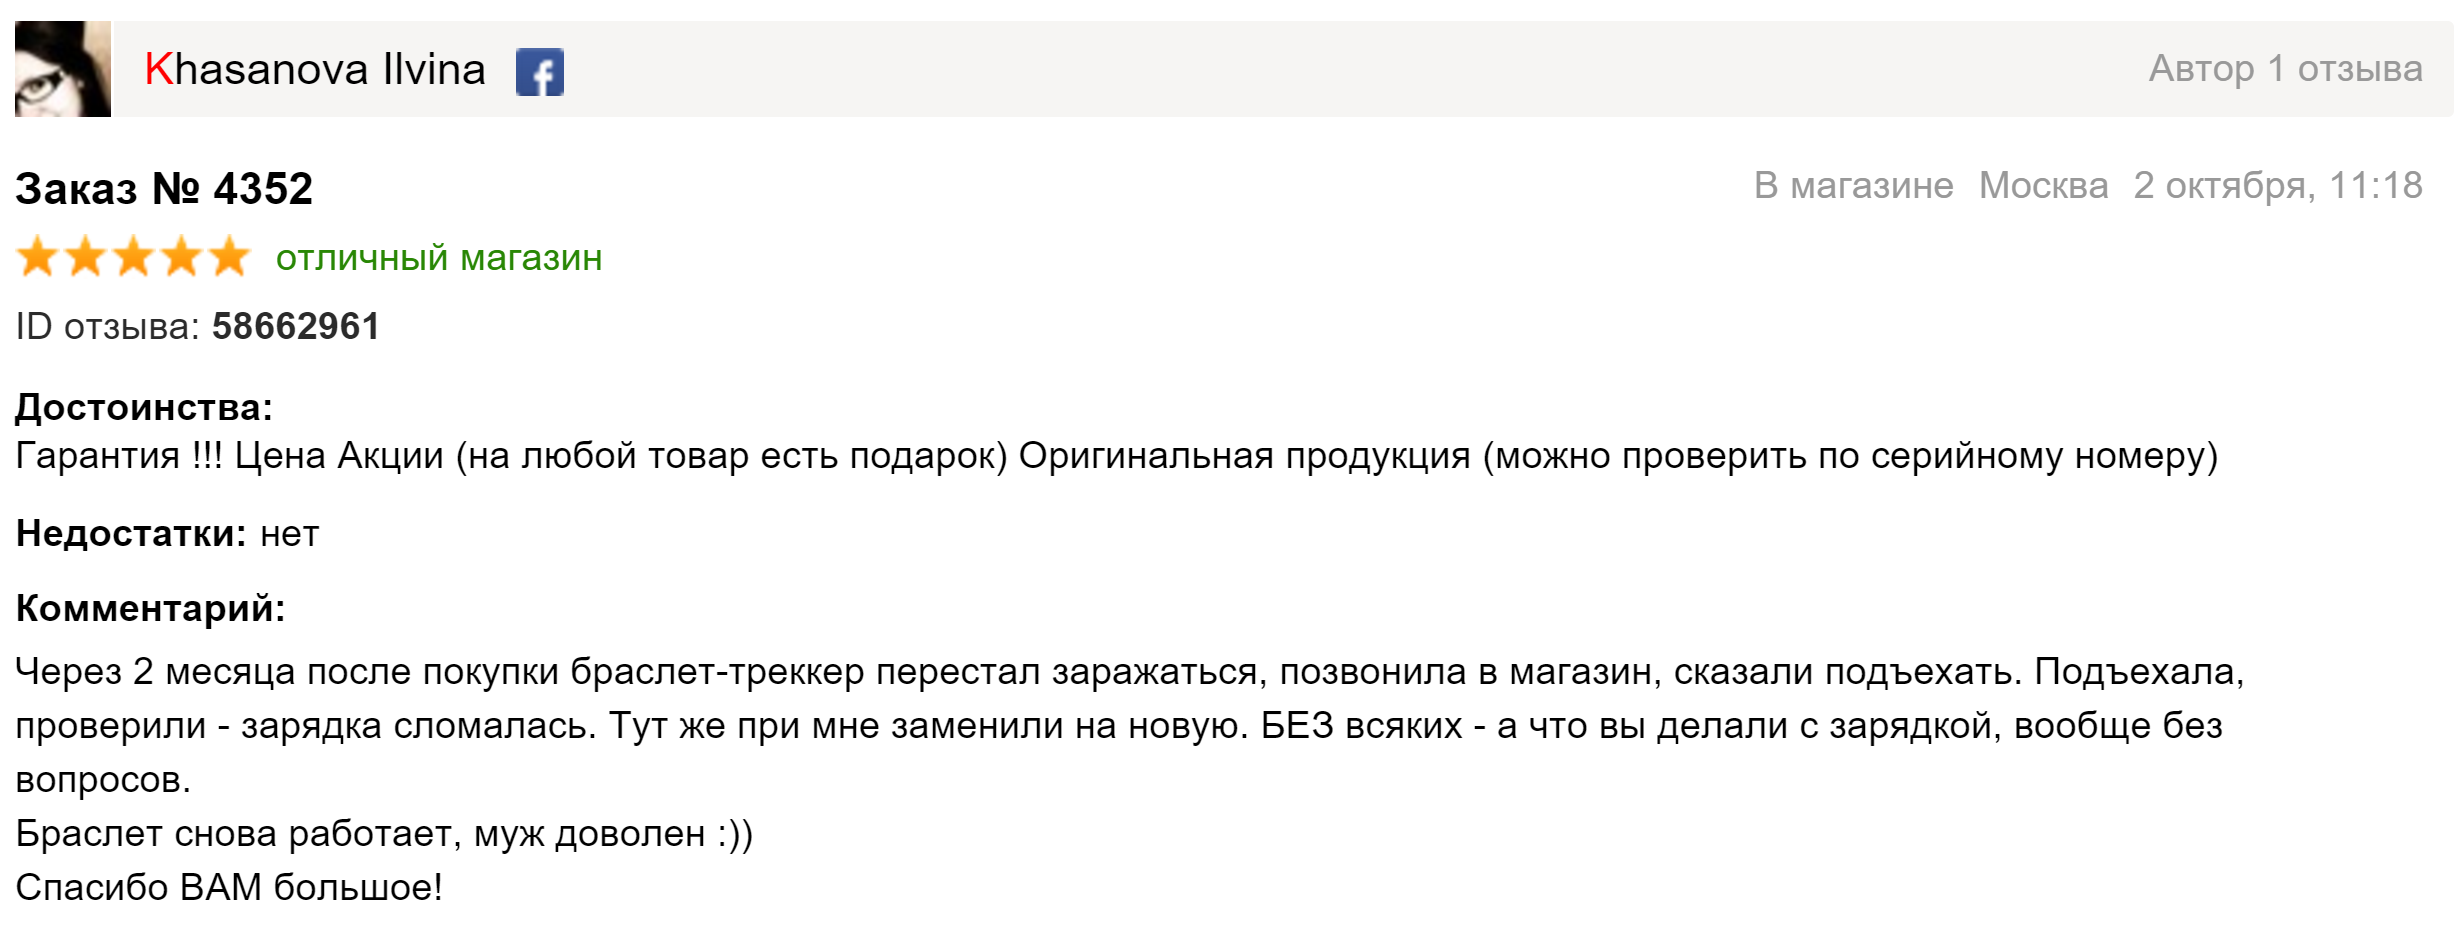 screenshot-29nov2015-01.58.01.png